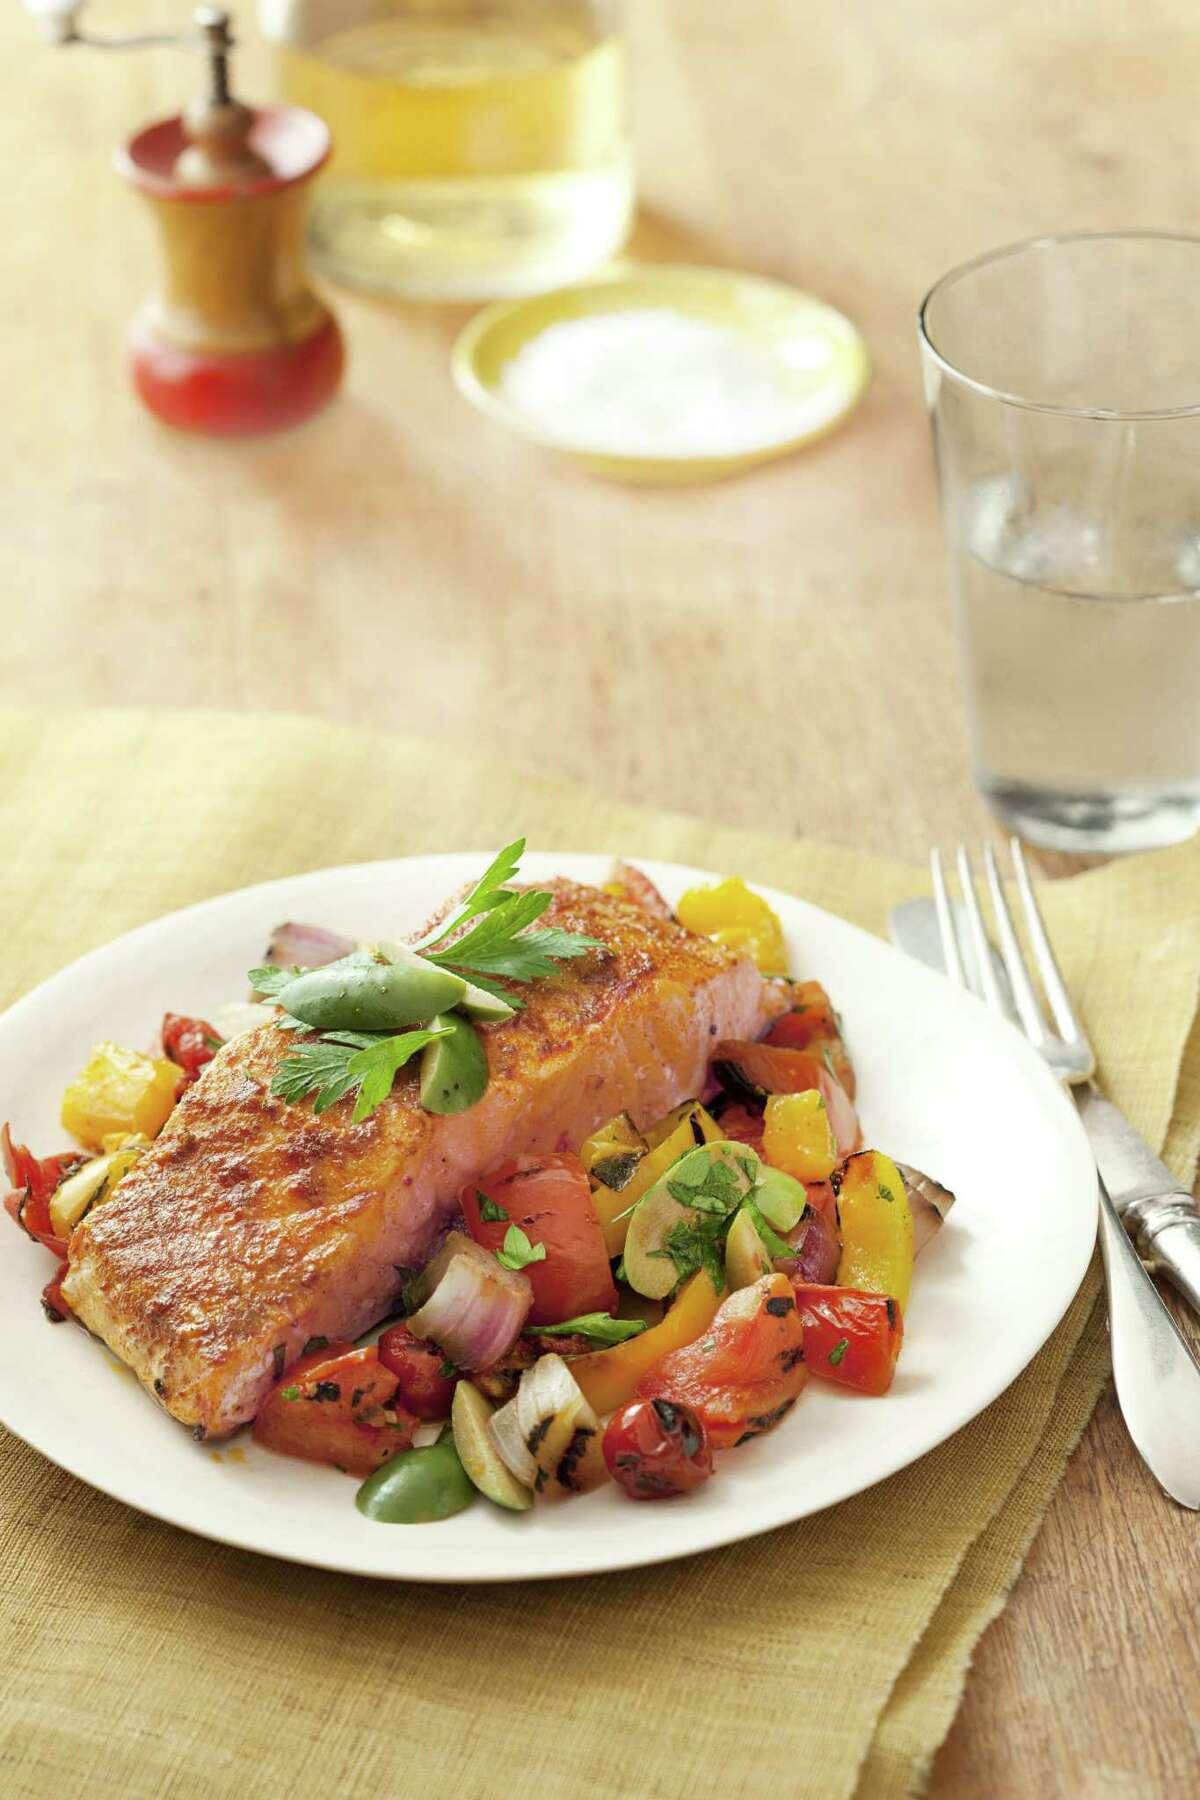 Good Housekeeping recipe for Smoky Spanish Salmon.